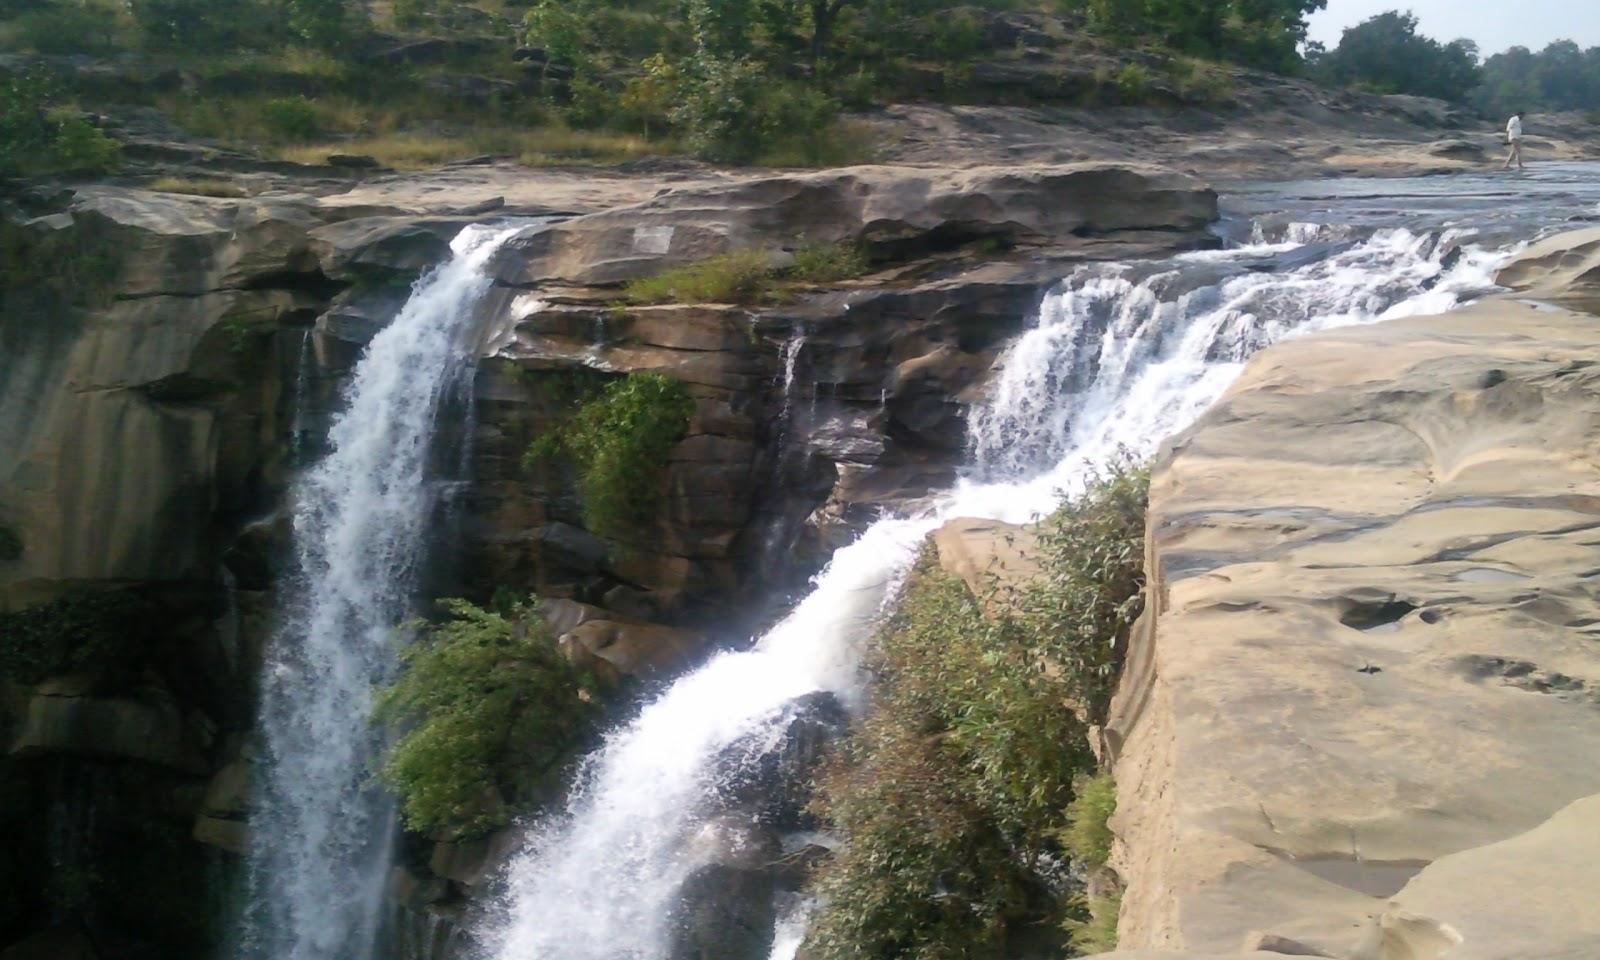 Amrit Dara Waterfall - Baikunthpur Image